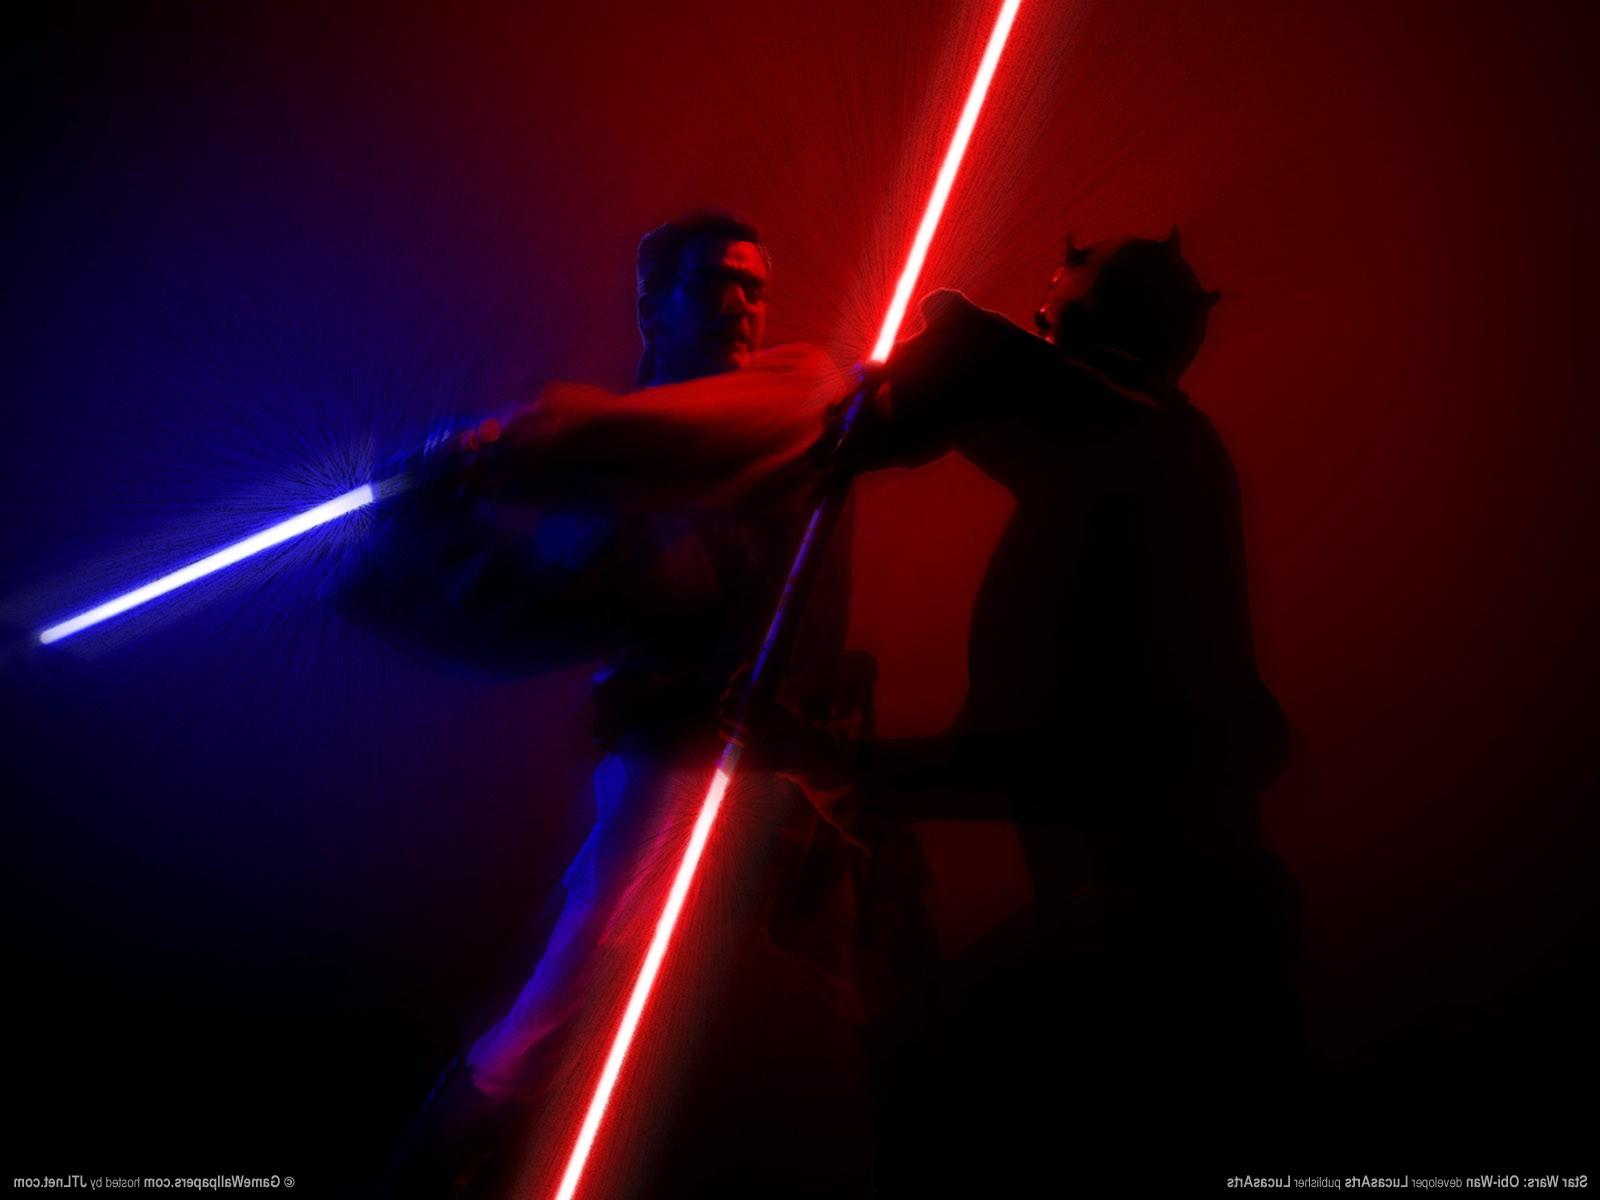 Wallpaper Star Wars Night Science Fiction Lightsaber Obi Wan Kenobi Laser Midnight Event Entertainment Darth Maul Light Lighting Performance Darkness 1600x1200 Px Computer Wallpaper 1600x1200 786657 Hd Wallpapers Wallhere